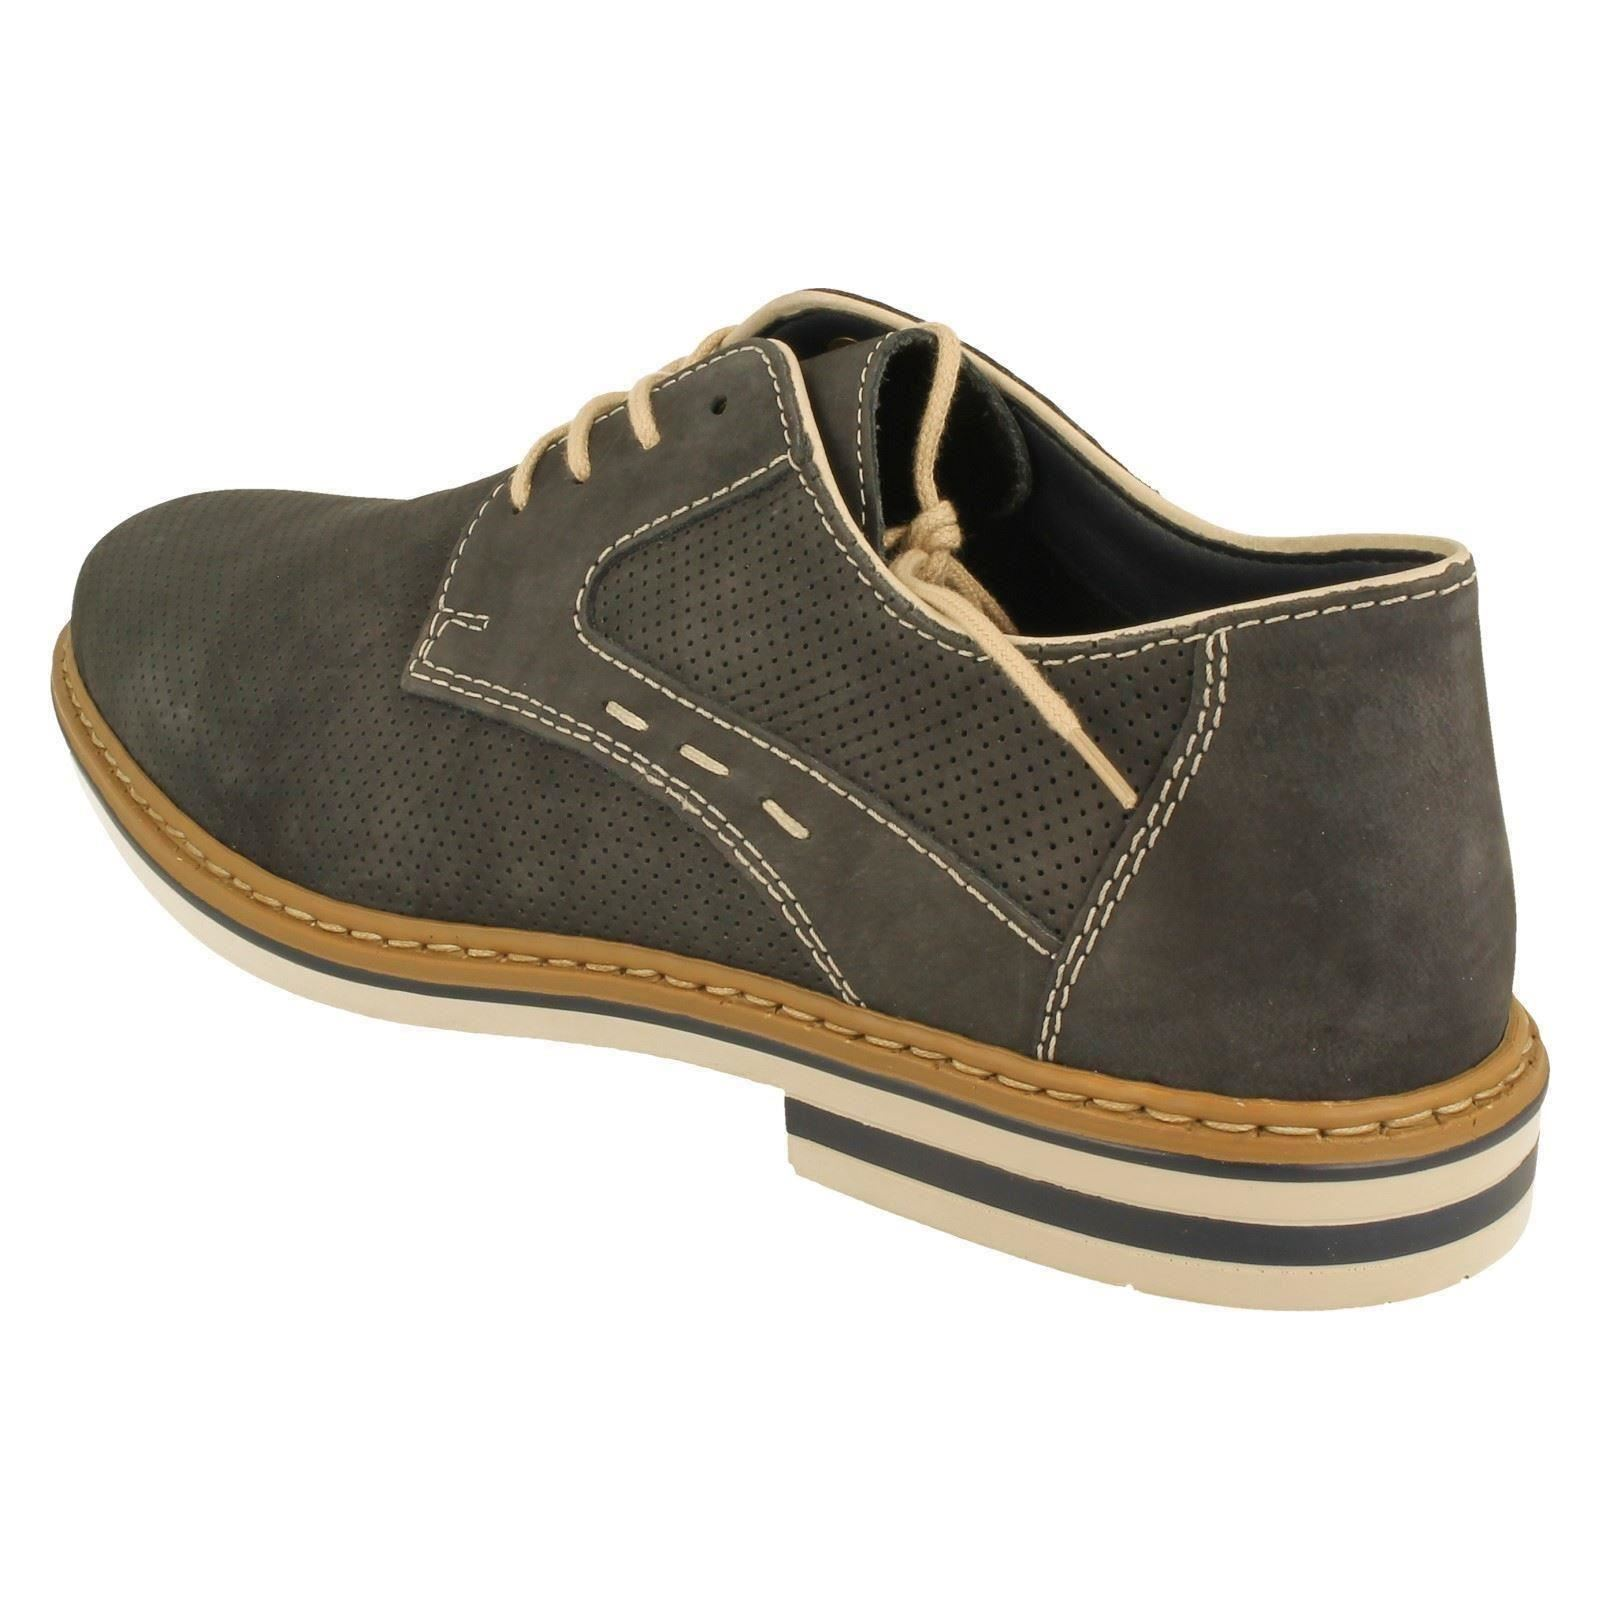 B1435-W Uomo Rieker Schuhes Label B1435-W  3bd831